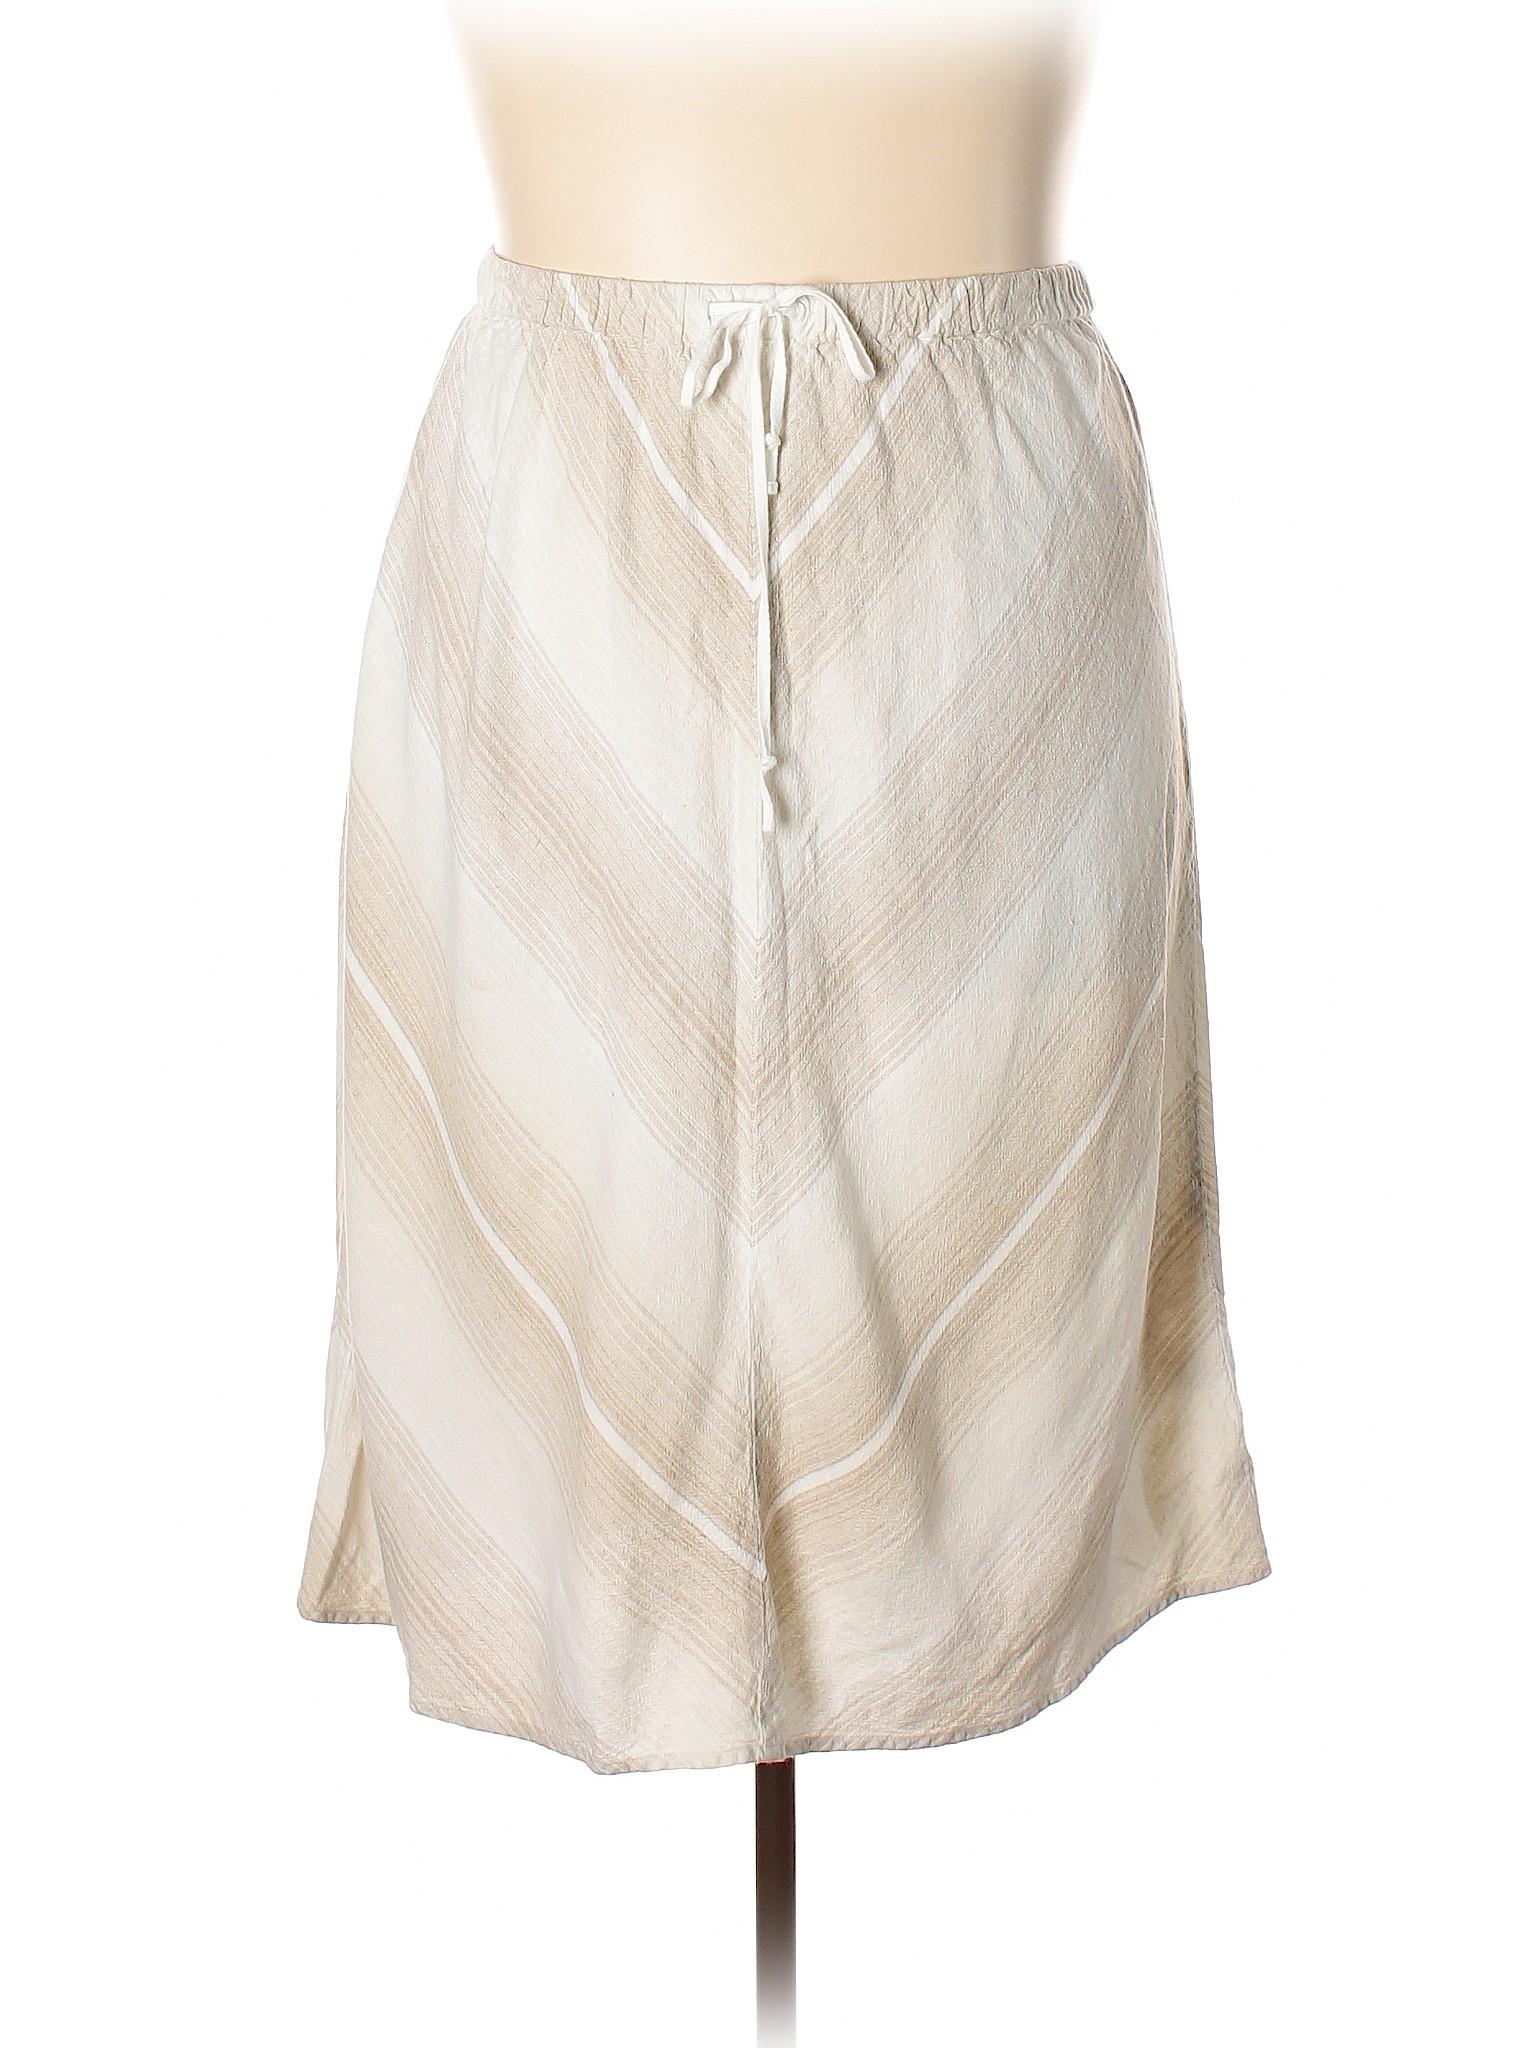 Boutique Boutique Casual Casual Casual Skirt Casual Skirt Boutique Skirt Boutique Skirt Boutique Boutique Casual Skirt qOgwIS7nO